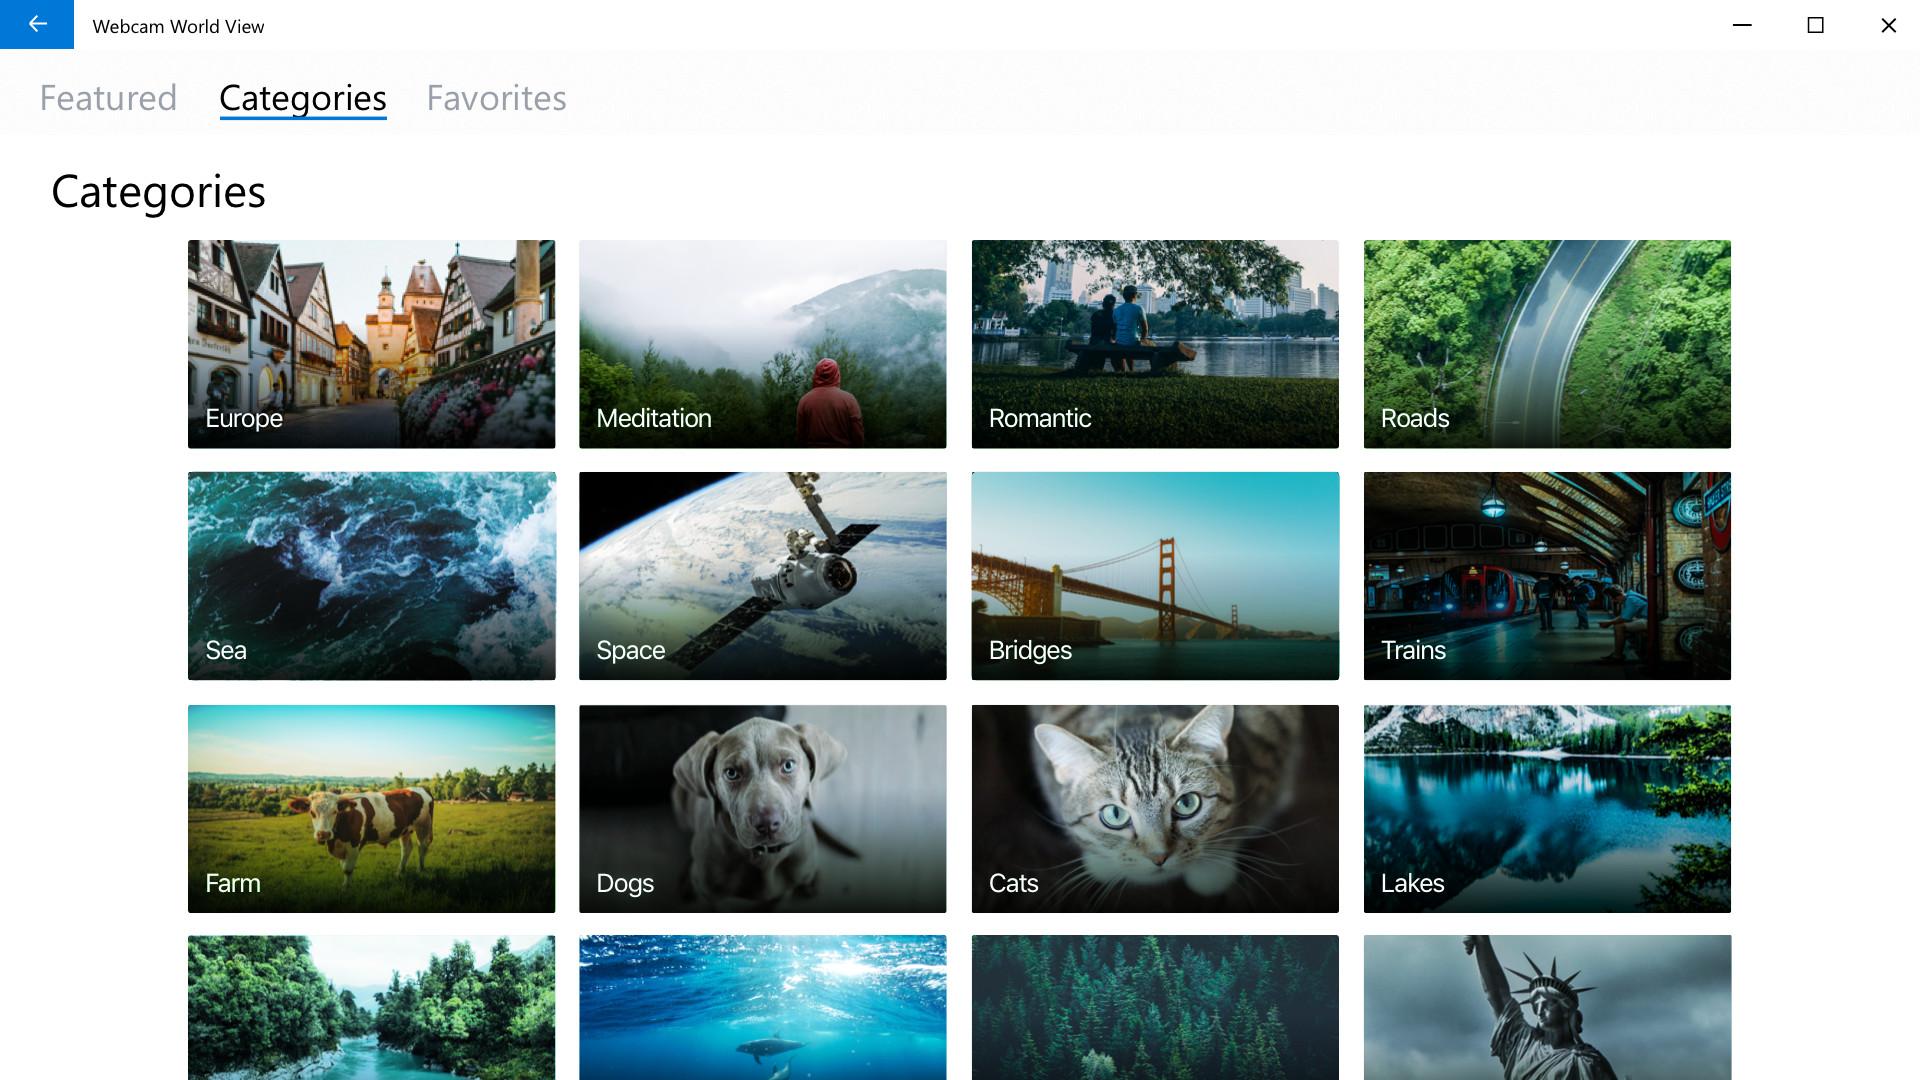 Webcam world view forum